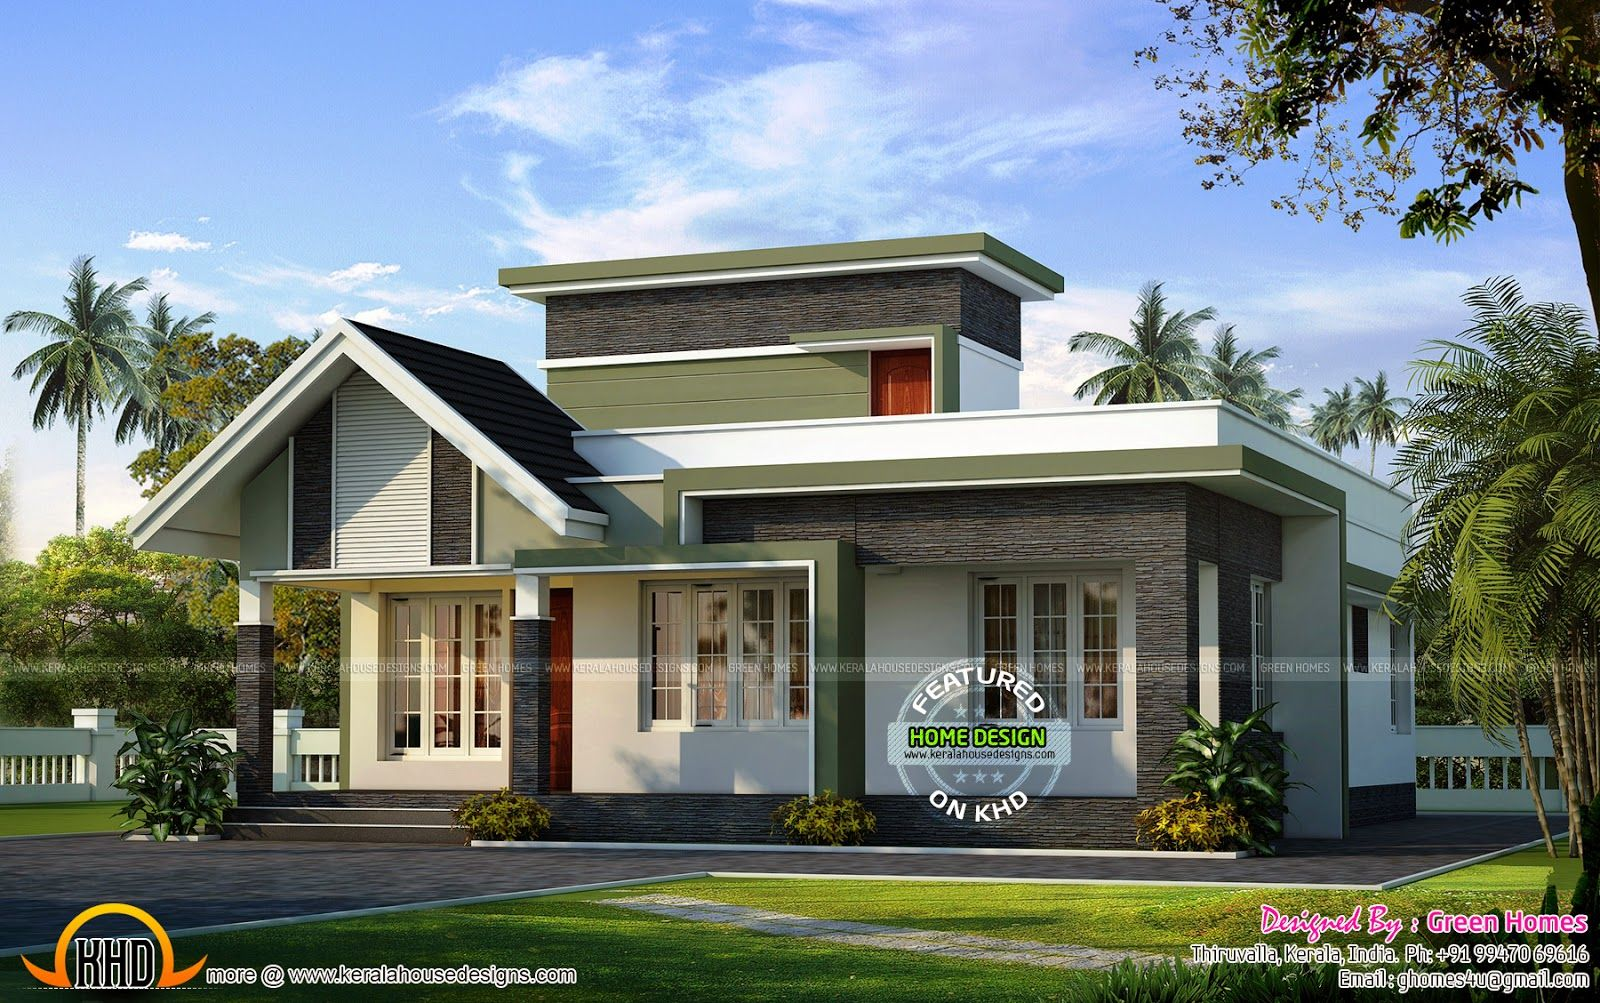 hermosas fotos de la casa en kerala Pin De Sahad Kollam En Sahad Design Casas Bonitas Casa